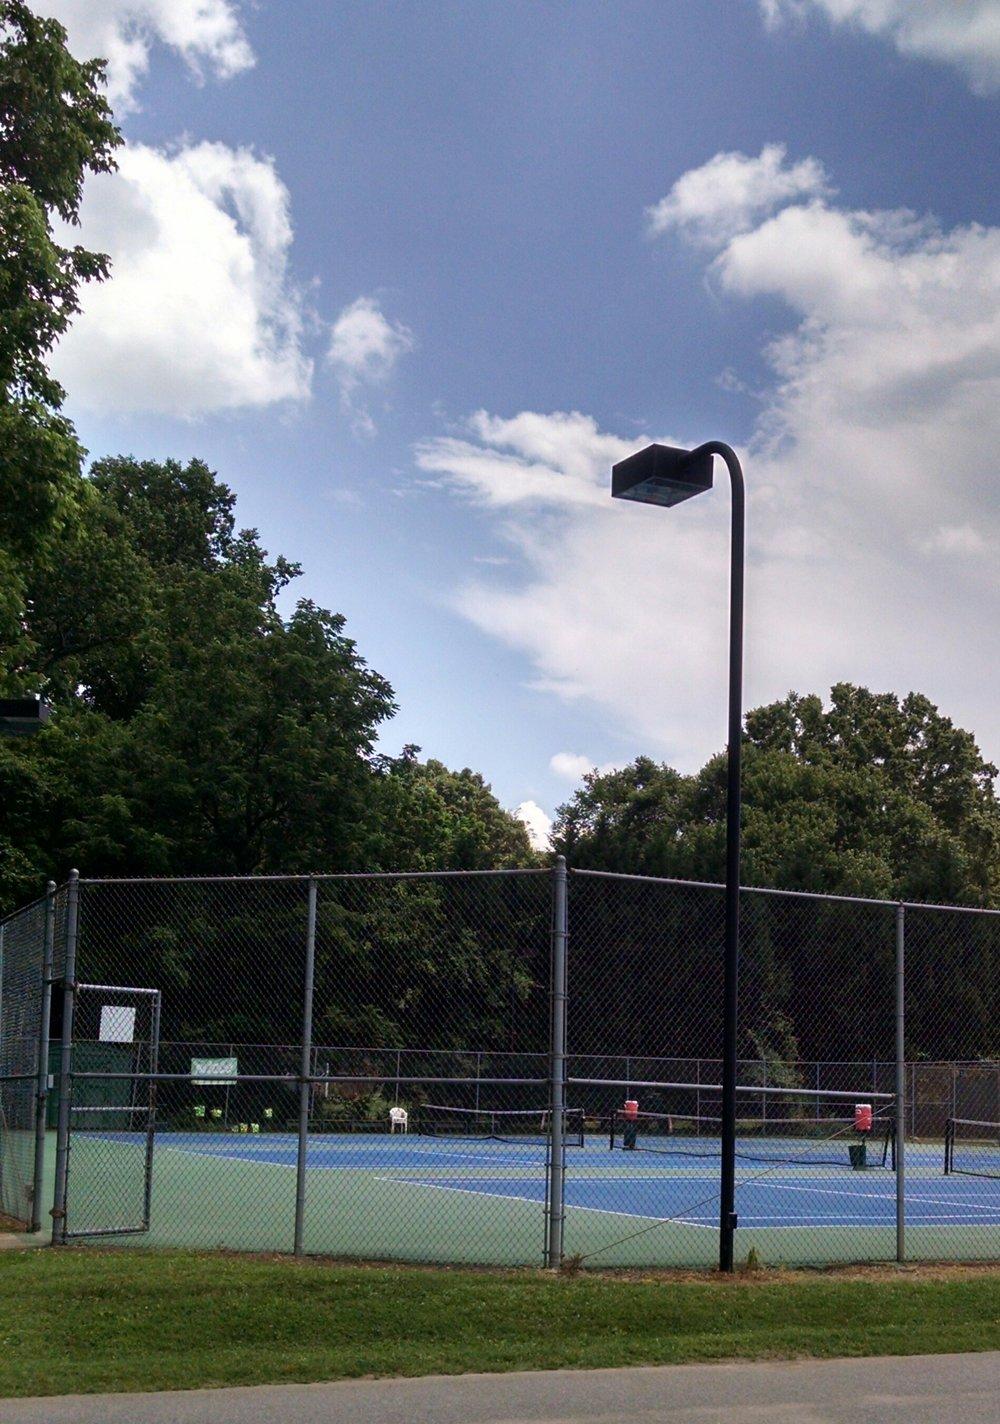 A Tennis Sky View.JPG